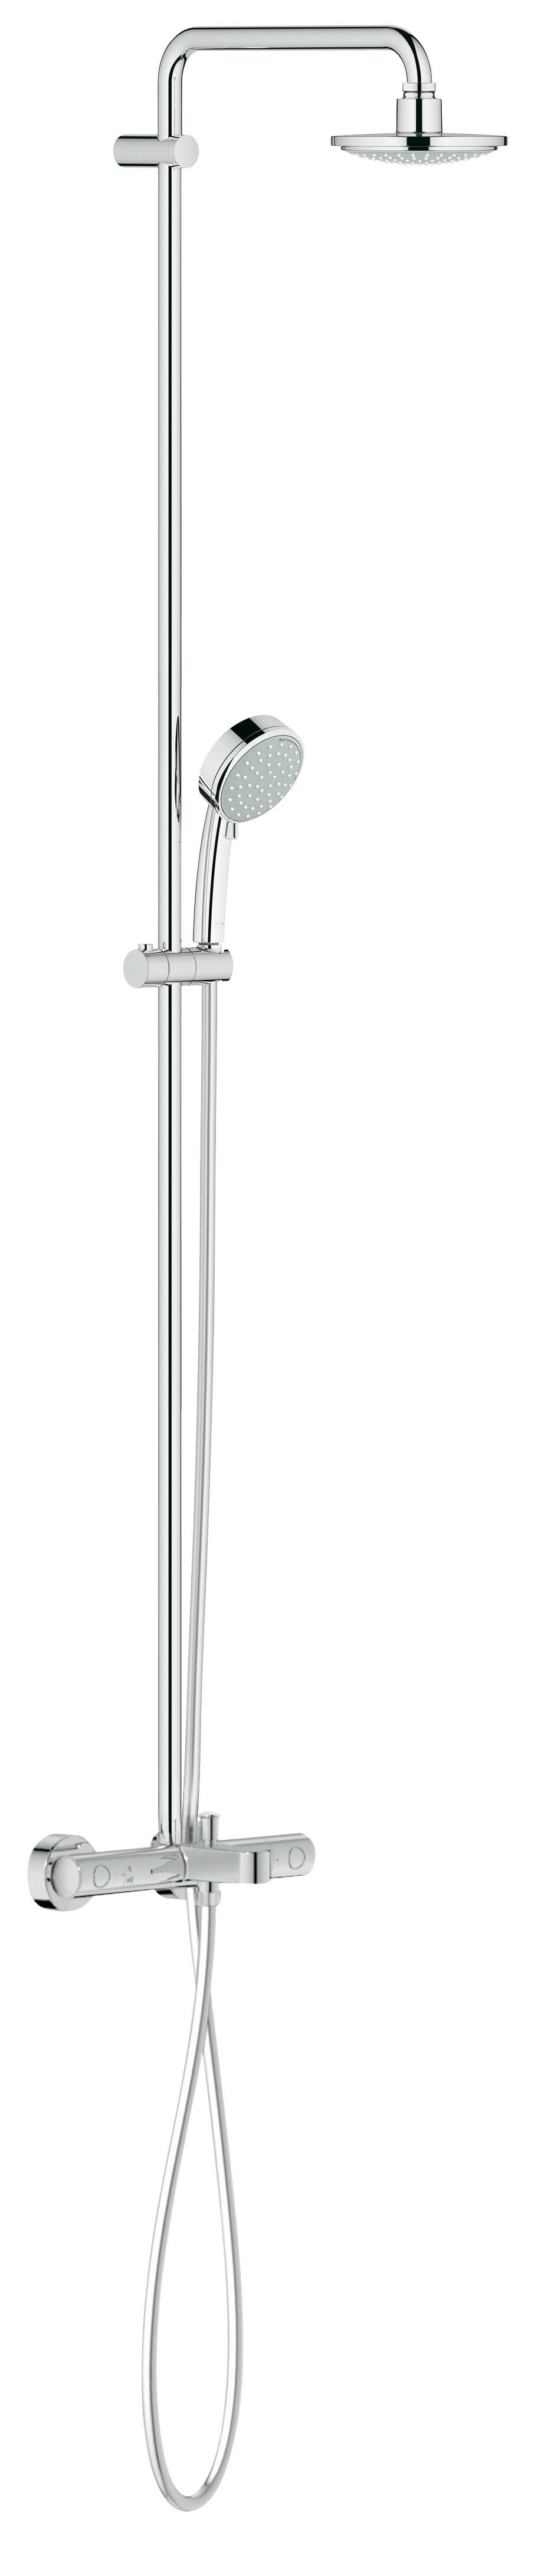 Grohe 26223000 Tempesta Cosmopolitan 160 с верхним и ручным душем, хром